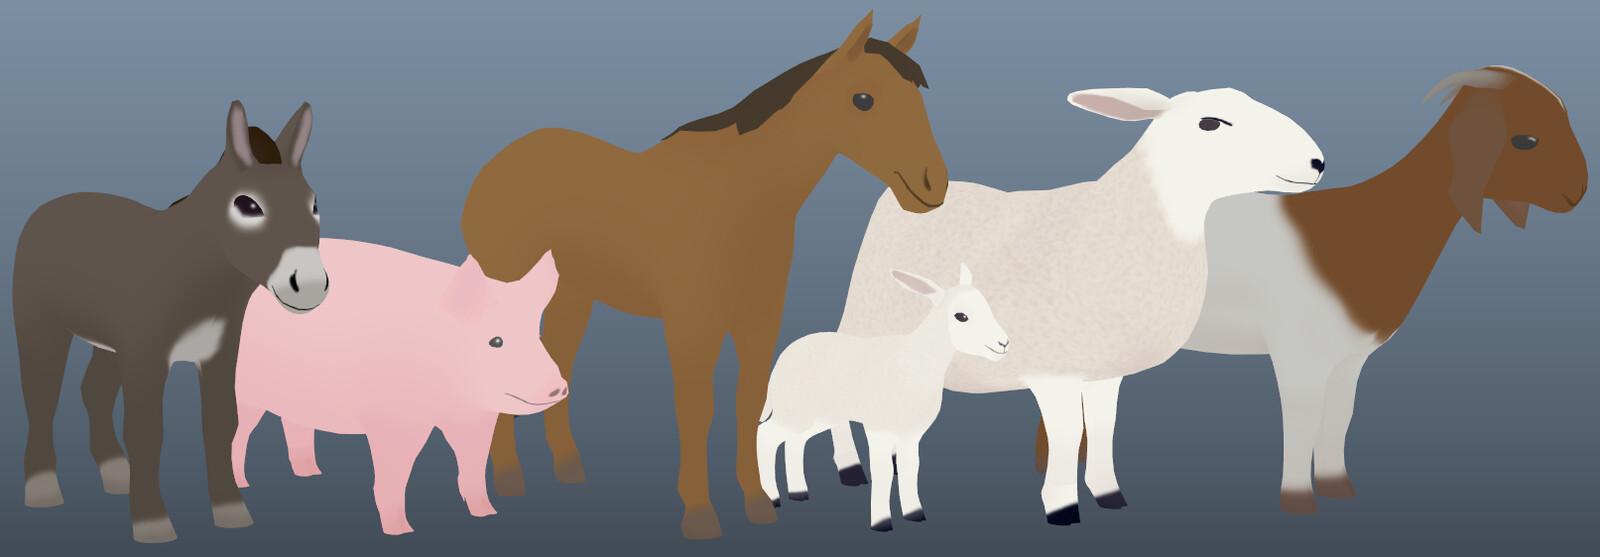 Farm animal models